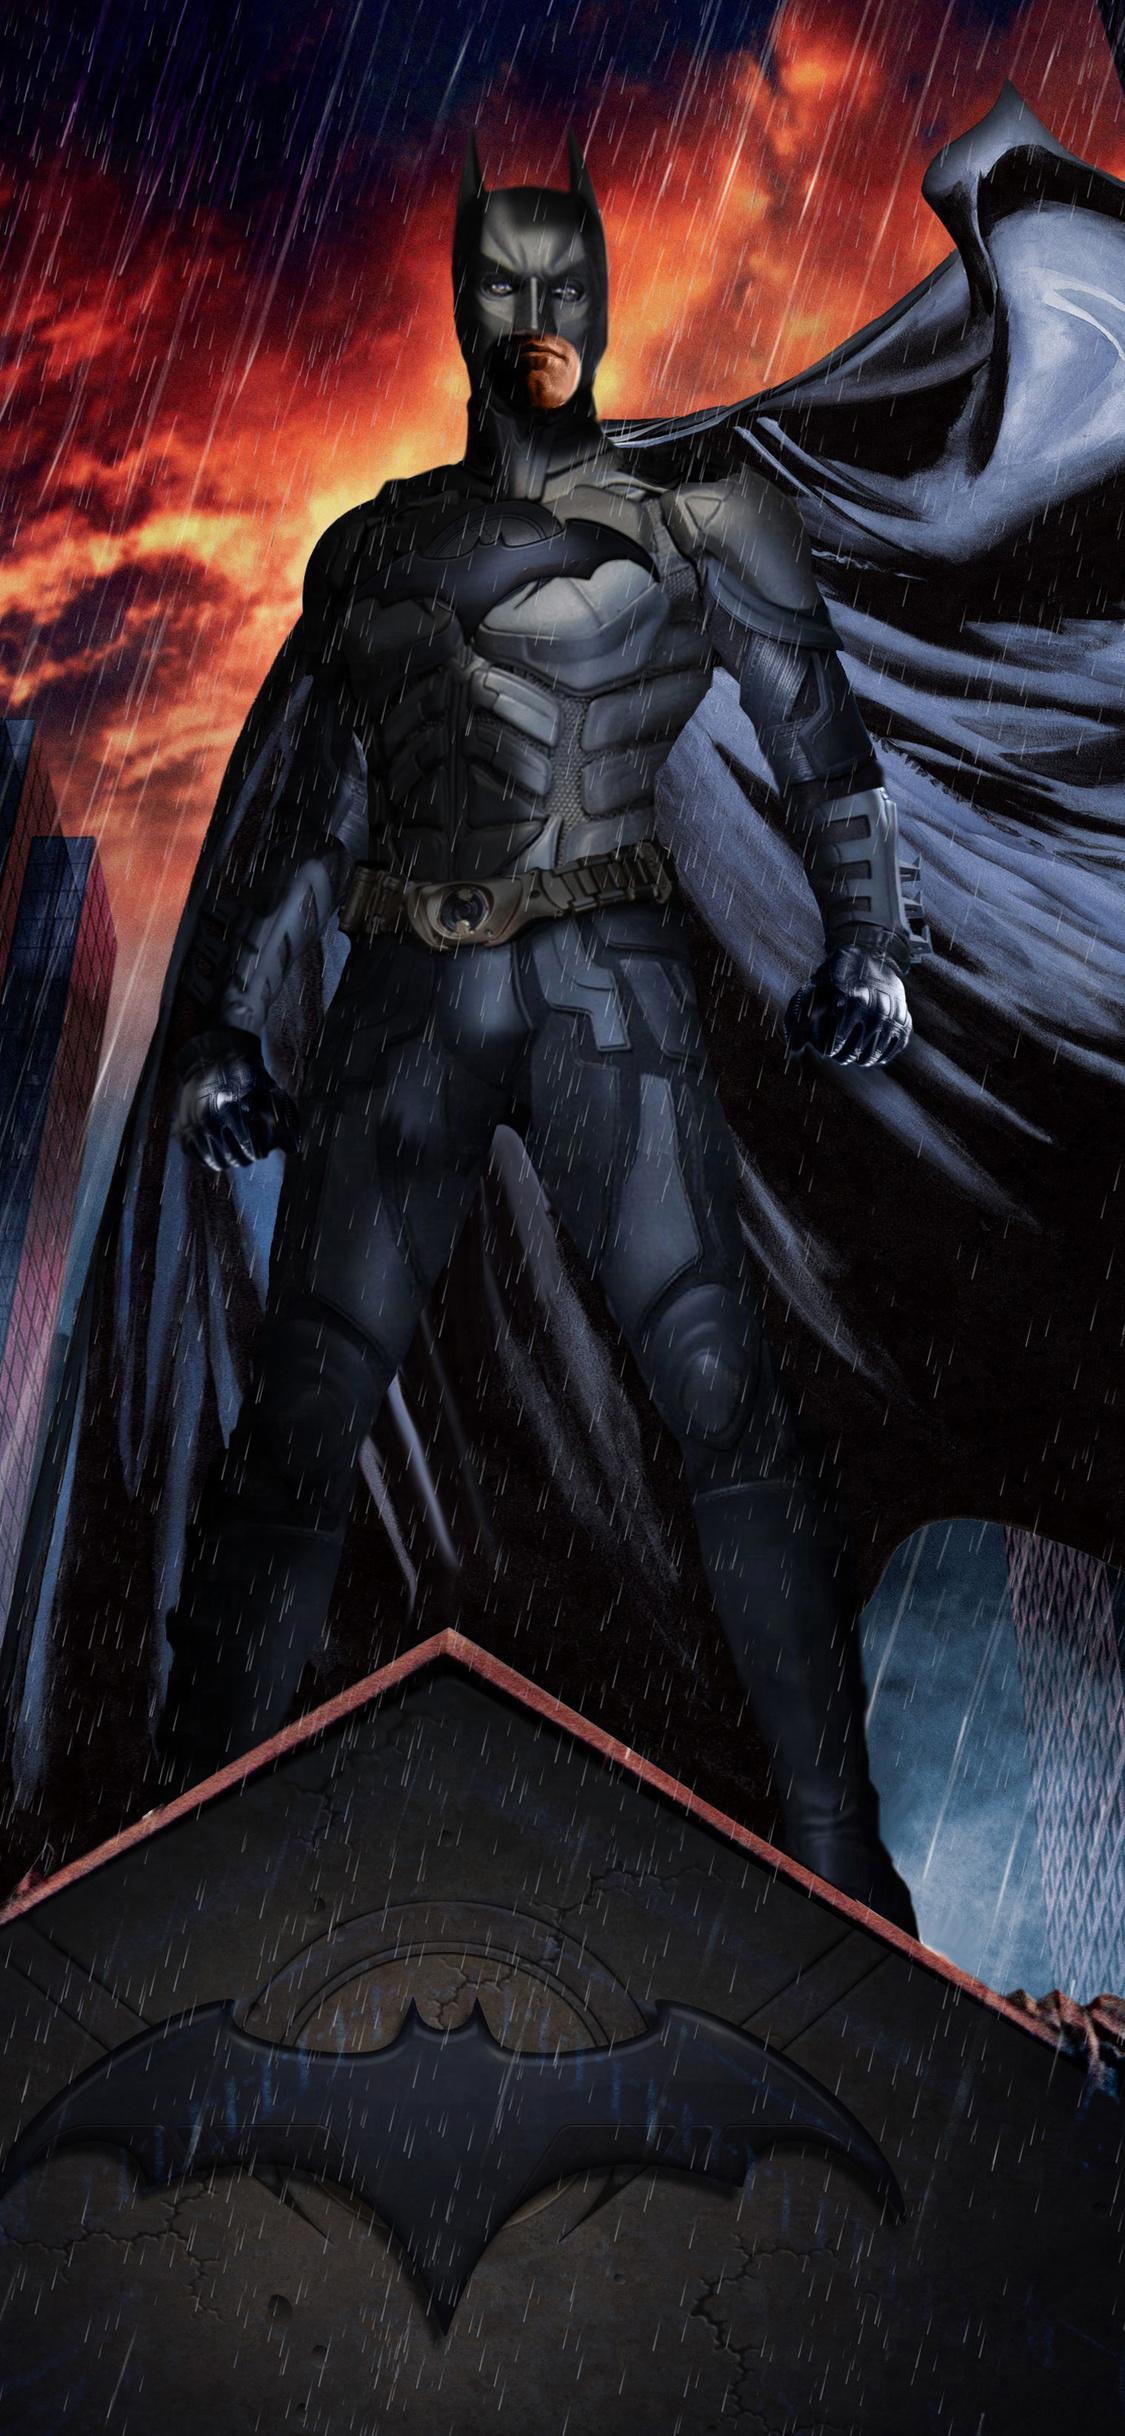 1125x2436 Batman And Man Of Steel Iphone Xs Iphone 10 Iphone X Hd